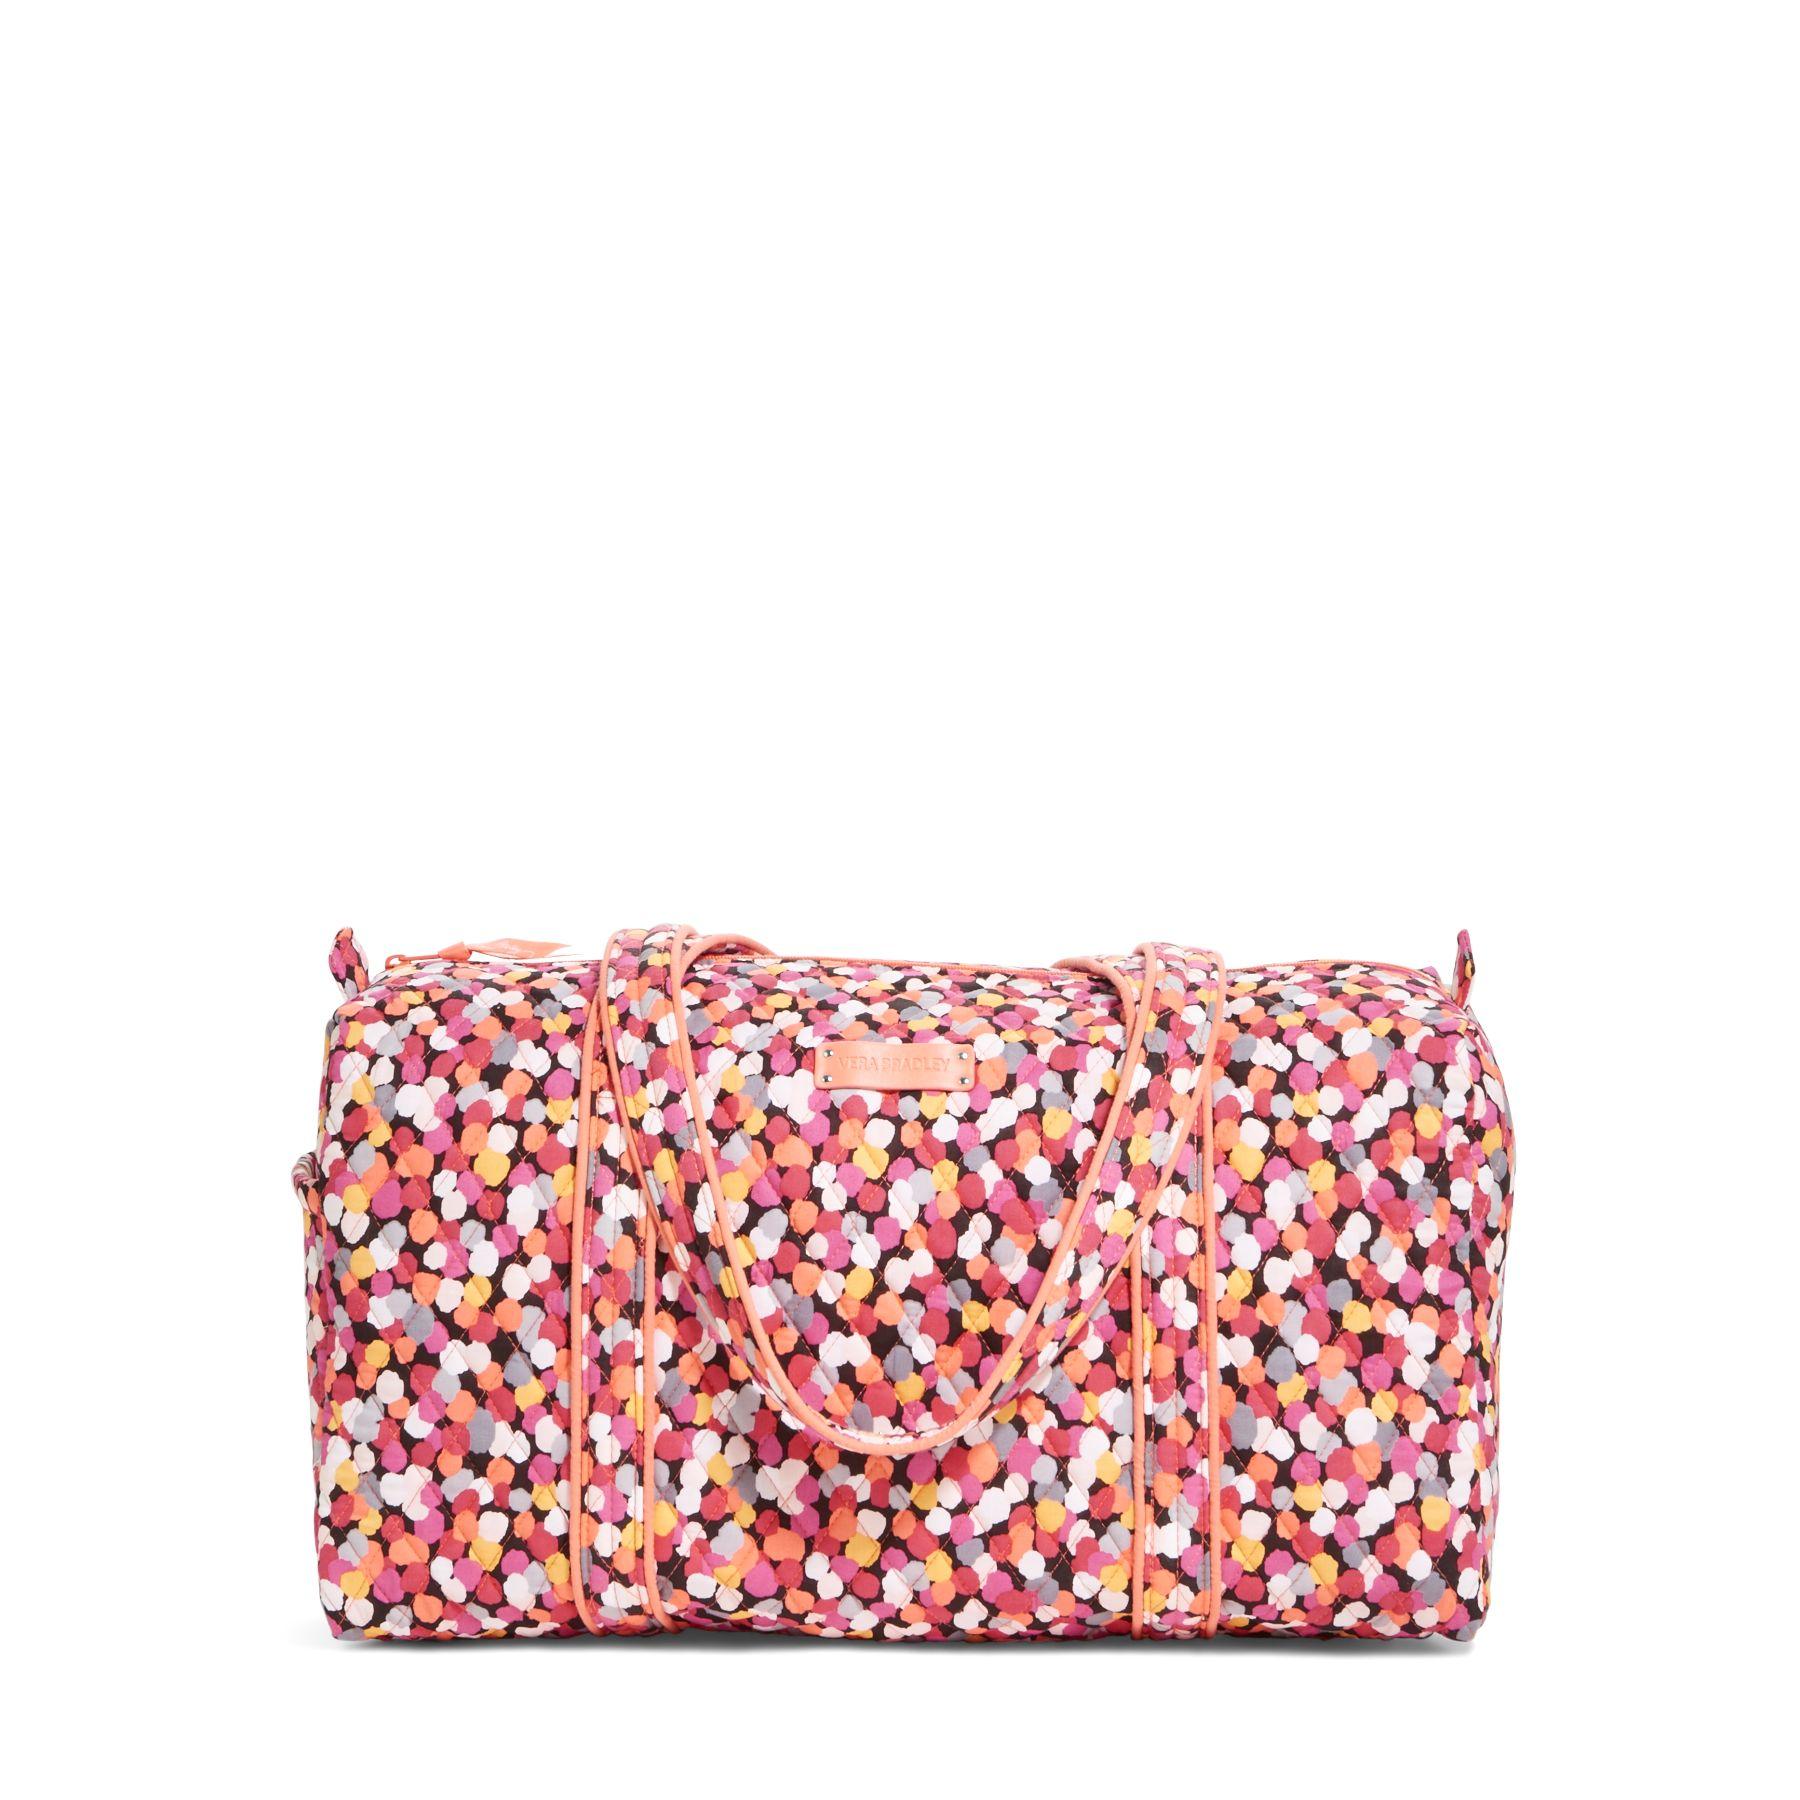 Gym Bag Vera Bradley: Vera Bradley Small Duffel Bag